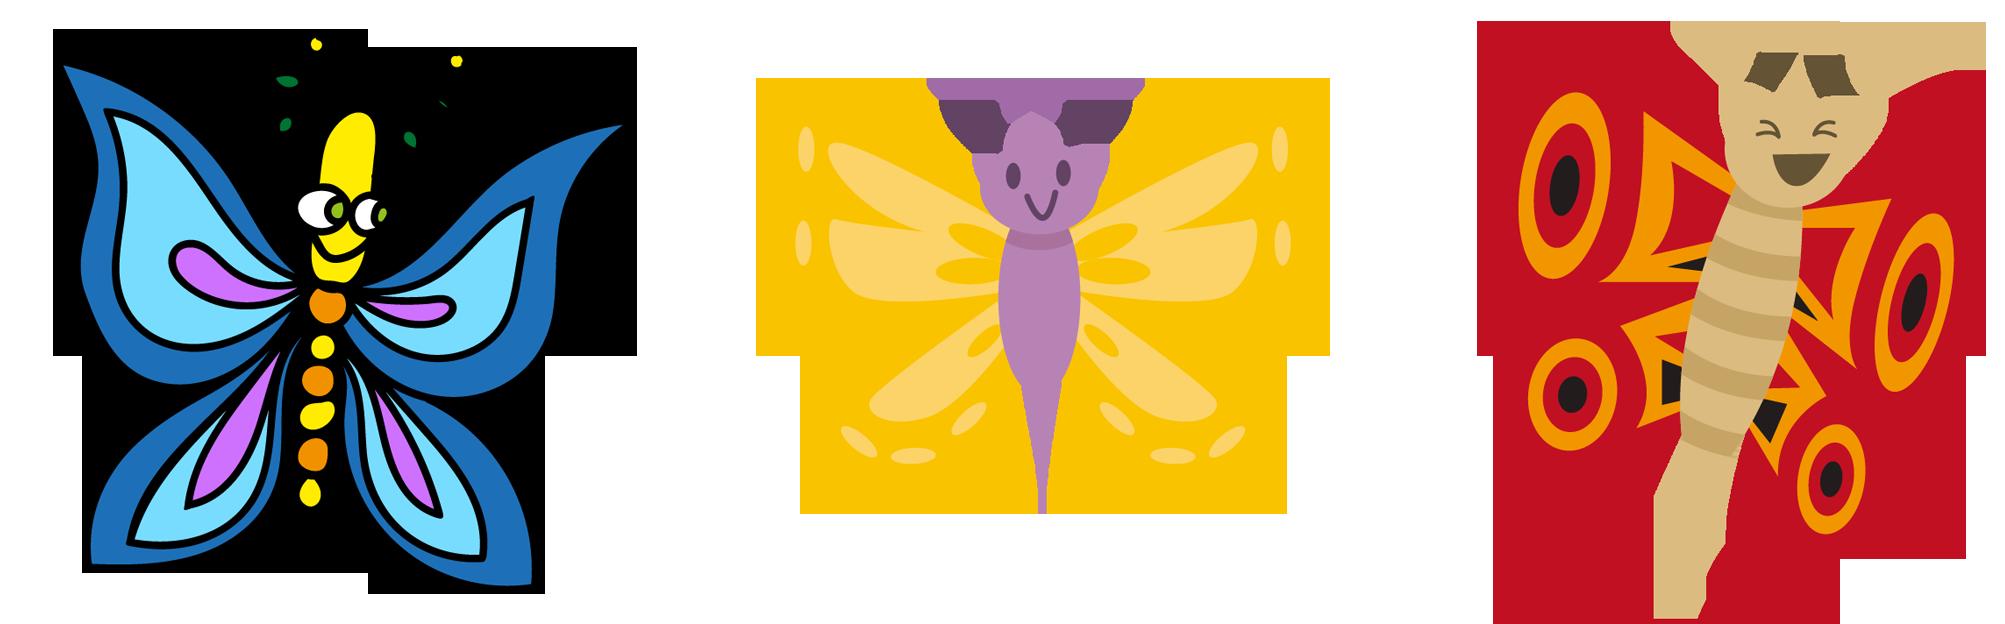 Pineapple clipart symmetrical. Butterfly cartoon clip art